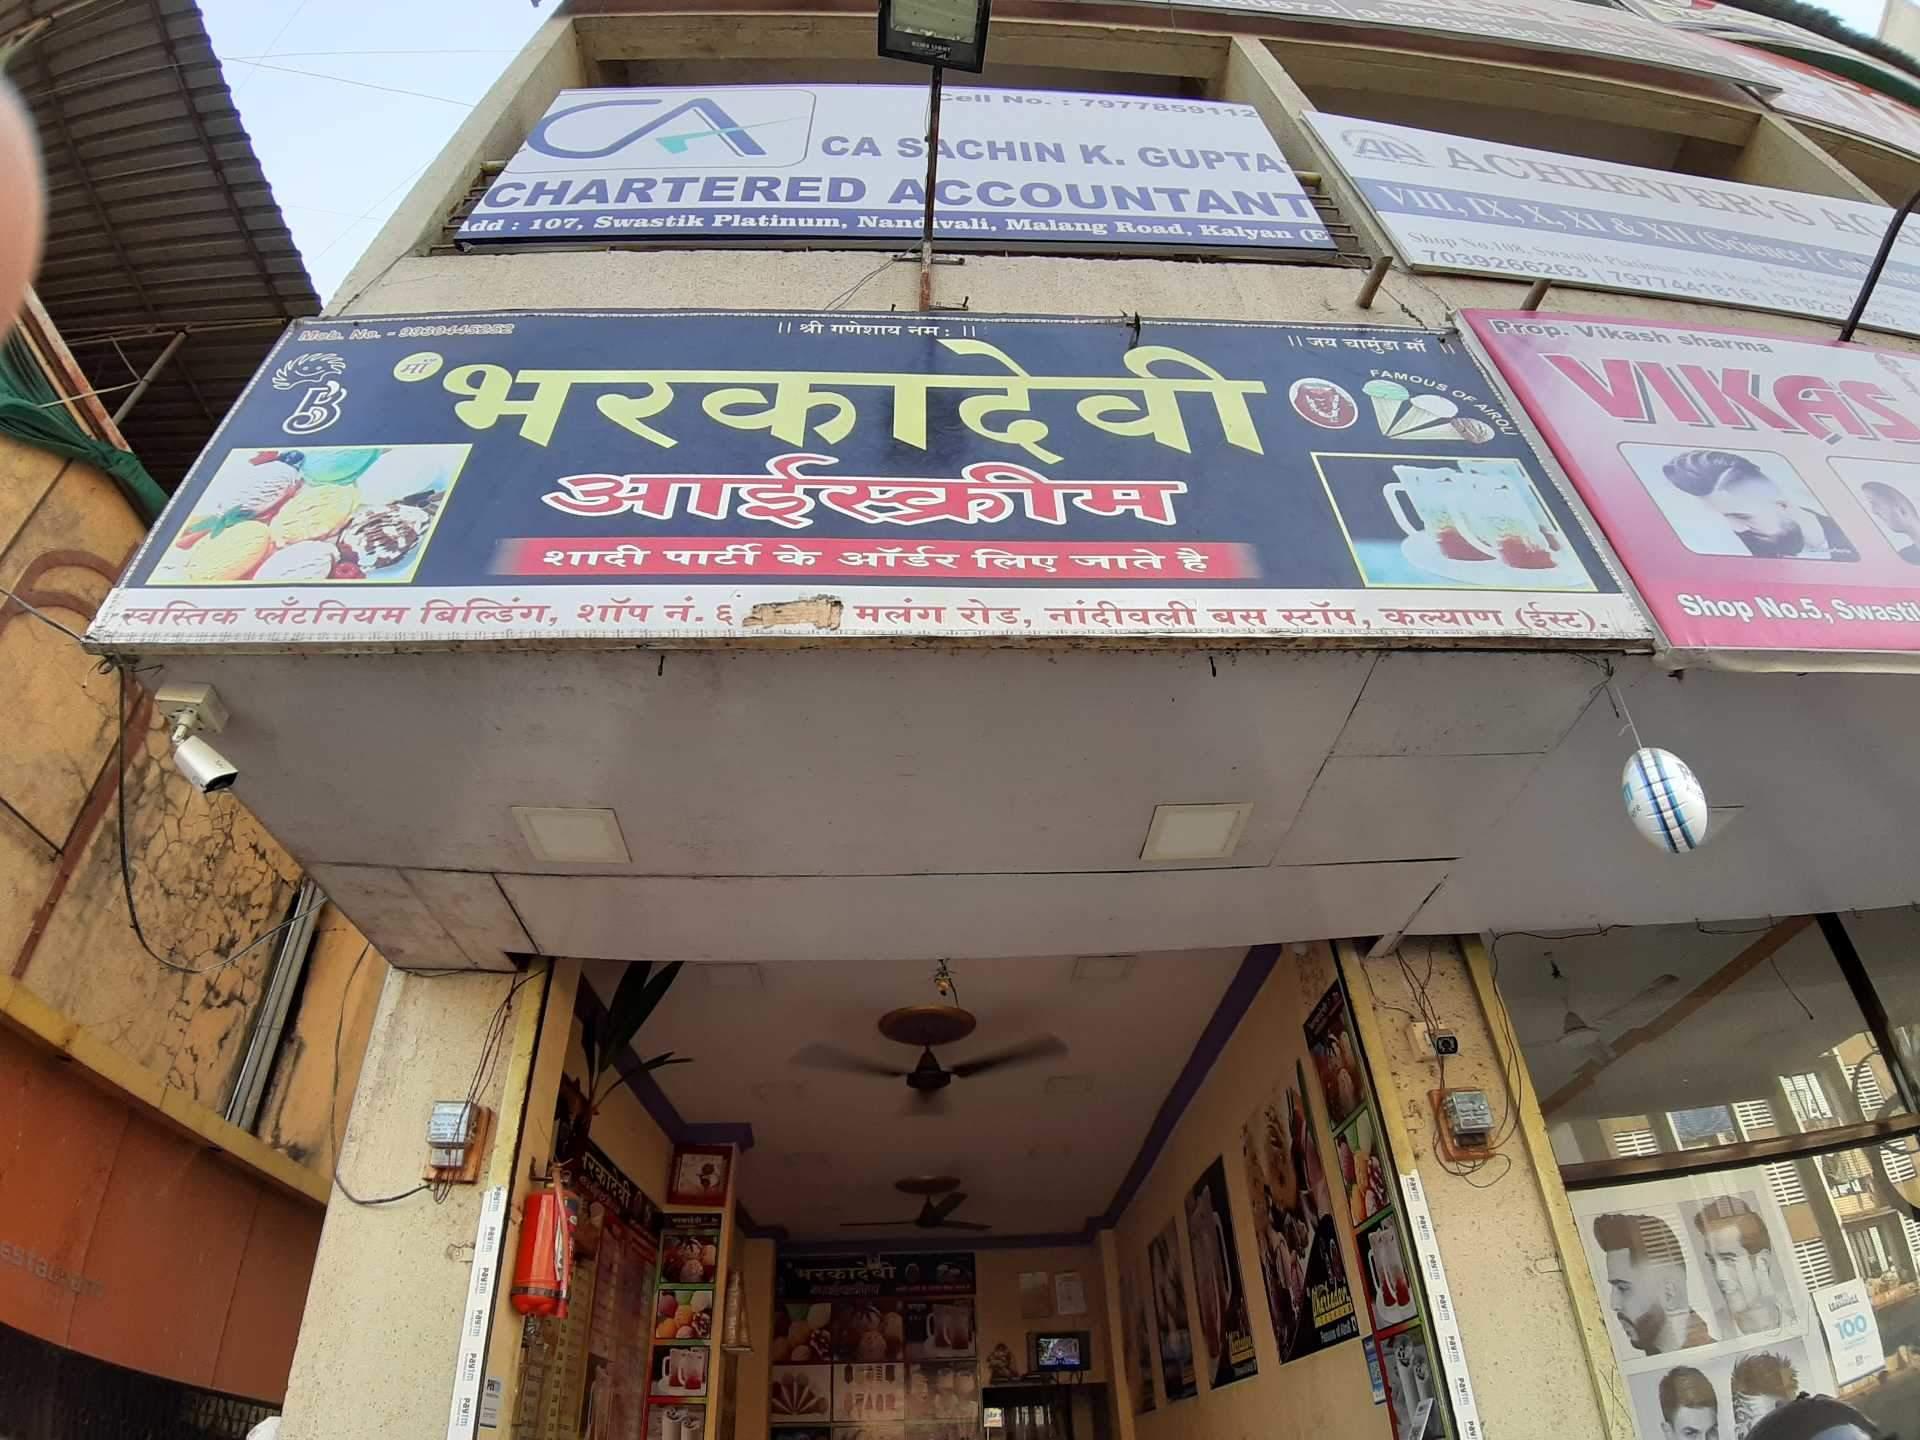 Find List Of Bharkadevi Ice Cream Parlours In Haji Malang Road Kalyan East Mumbai Justdial